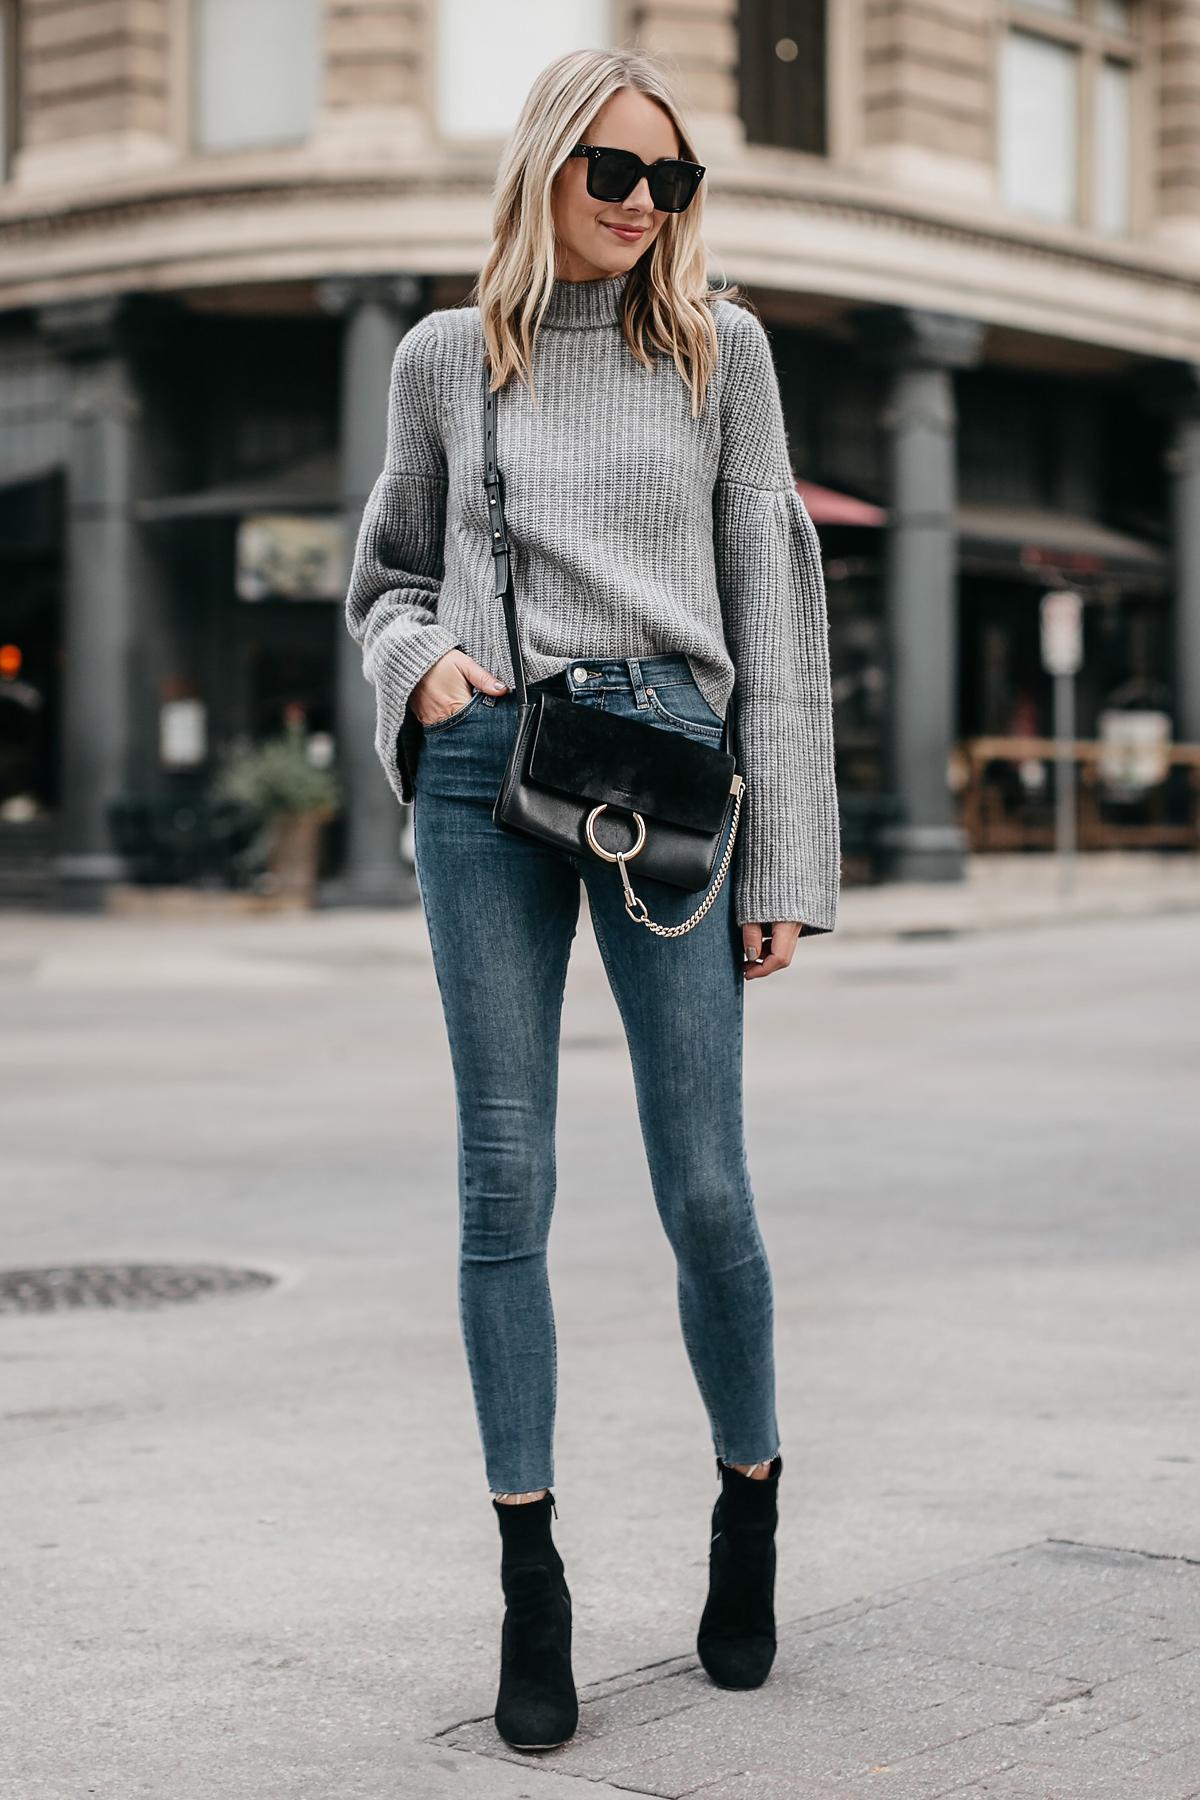 Blonde Woman Wearing Grey Bell Sleeve Sweater Denim Skinny Jeans Chloe Faye Black Handbag Black Booties Fashion Jackson Dallas Blogger Fashion Blogger Street Style